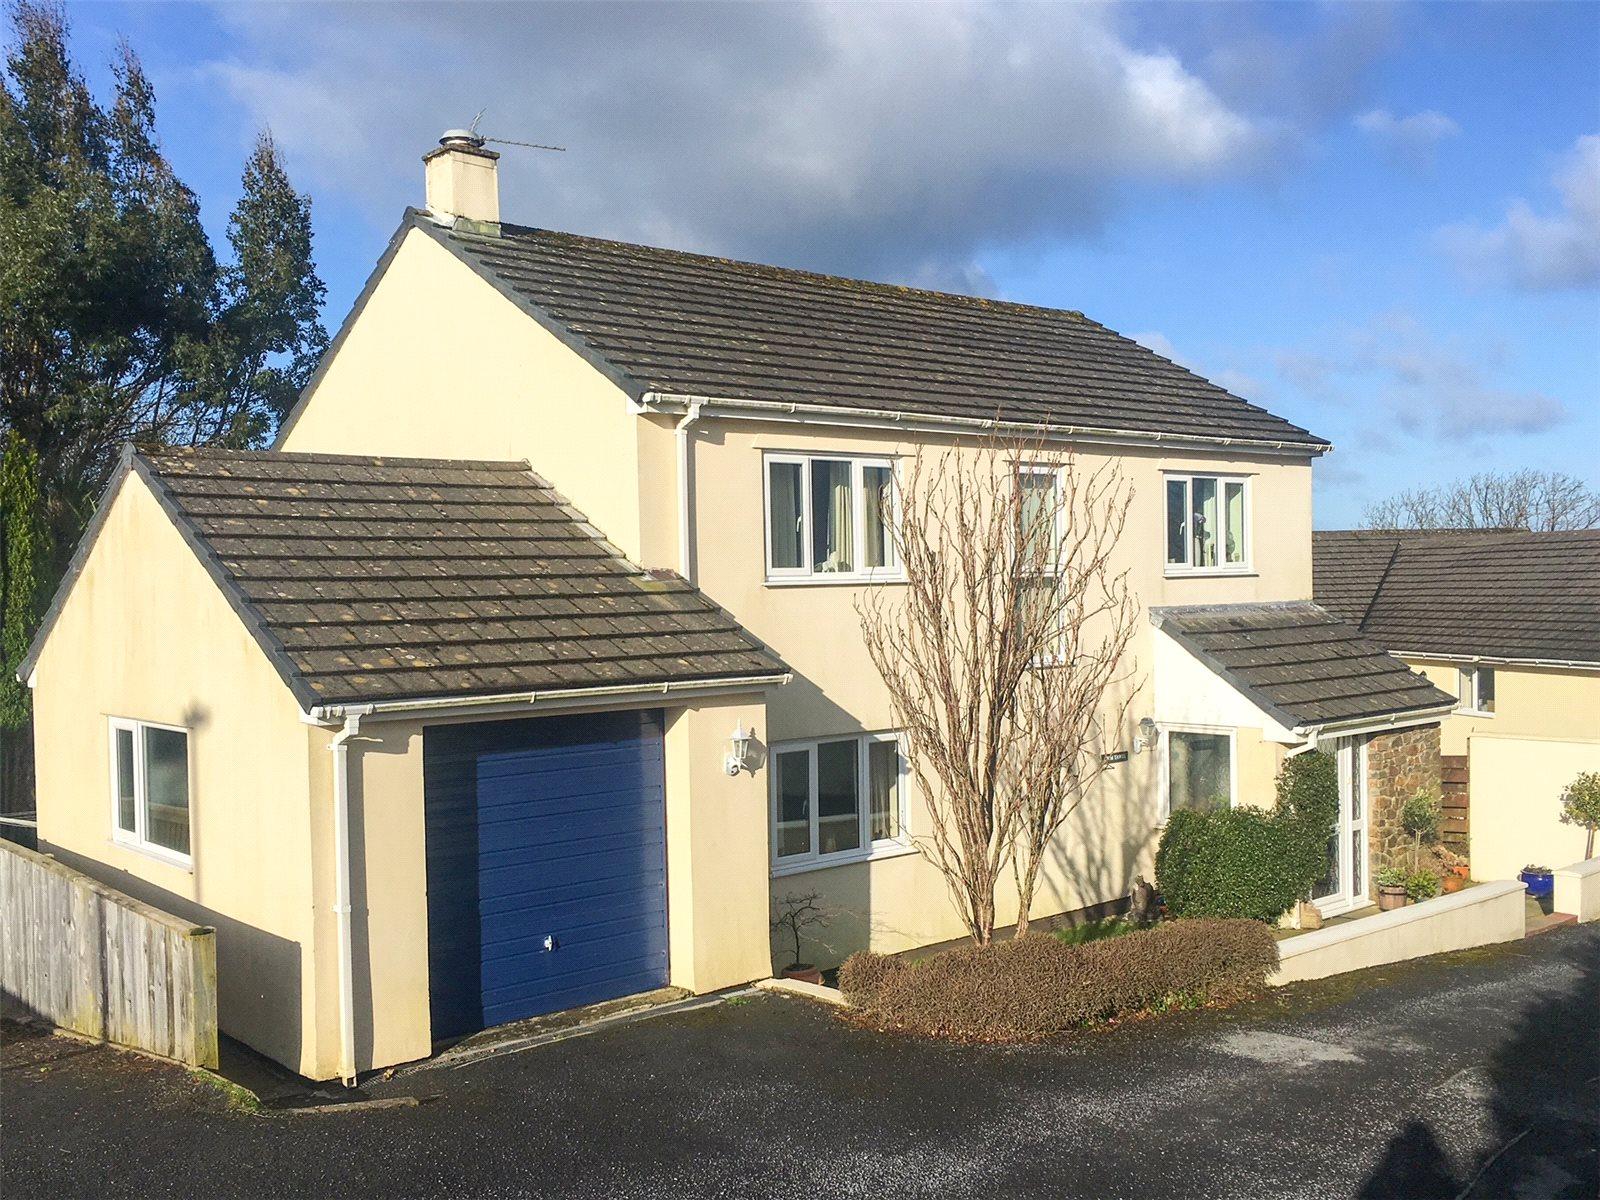 4 Bedrooms Detached House for sale in Cwm Tawel, Pentle Close, Pentlepoir, Saundersfoot